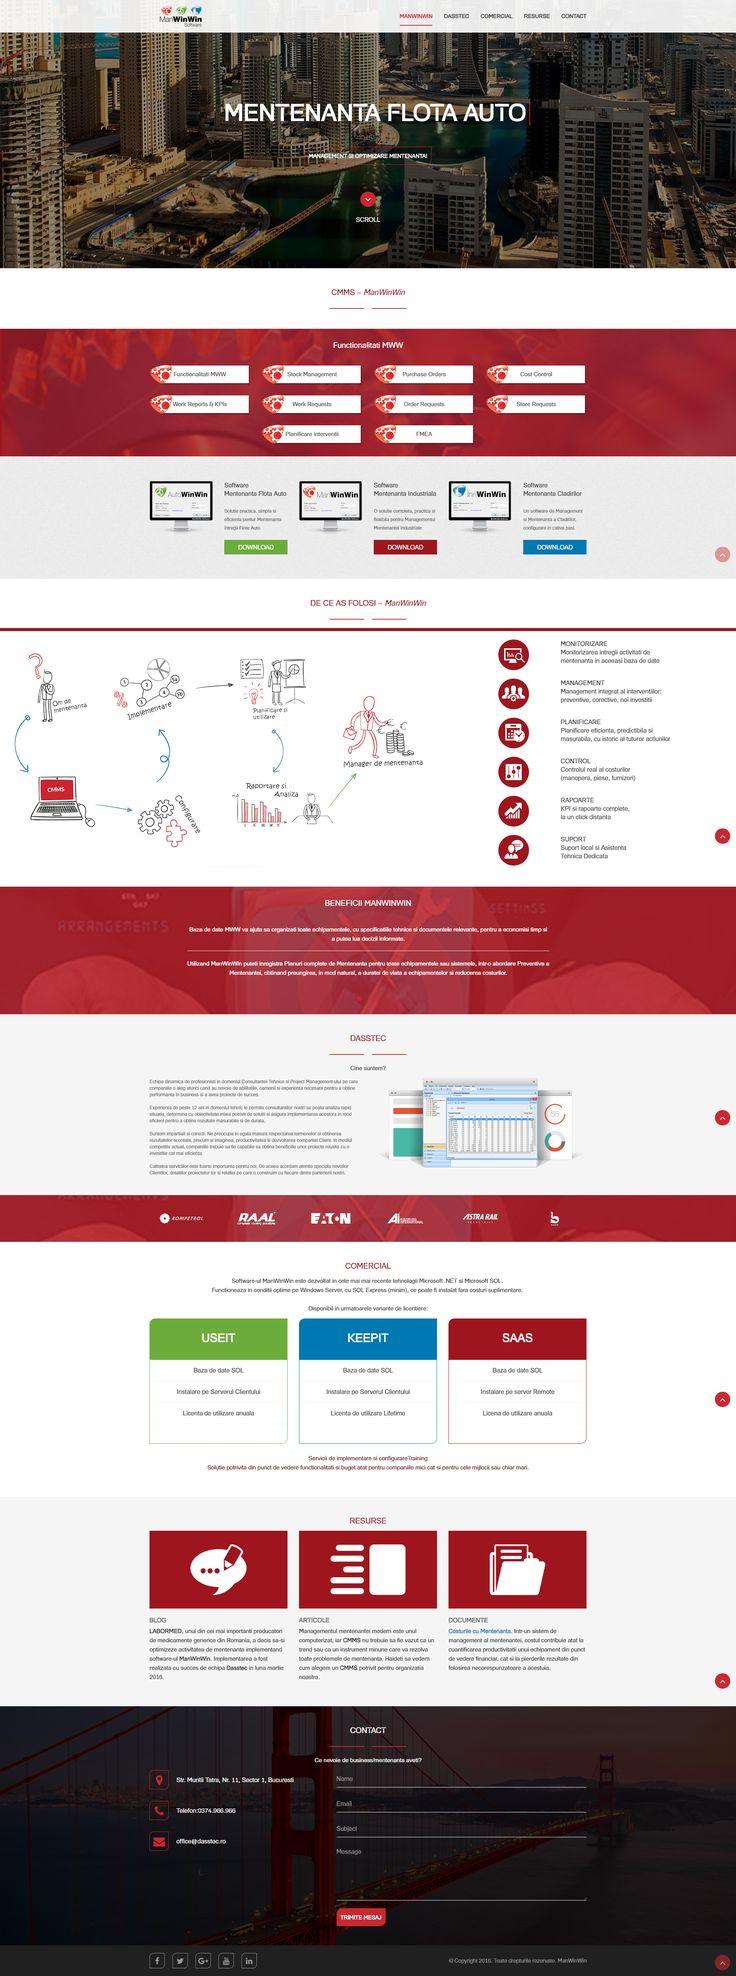 website design - cmms